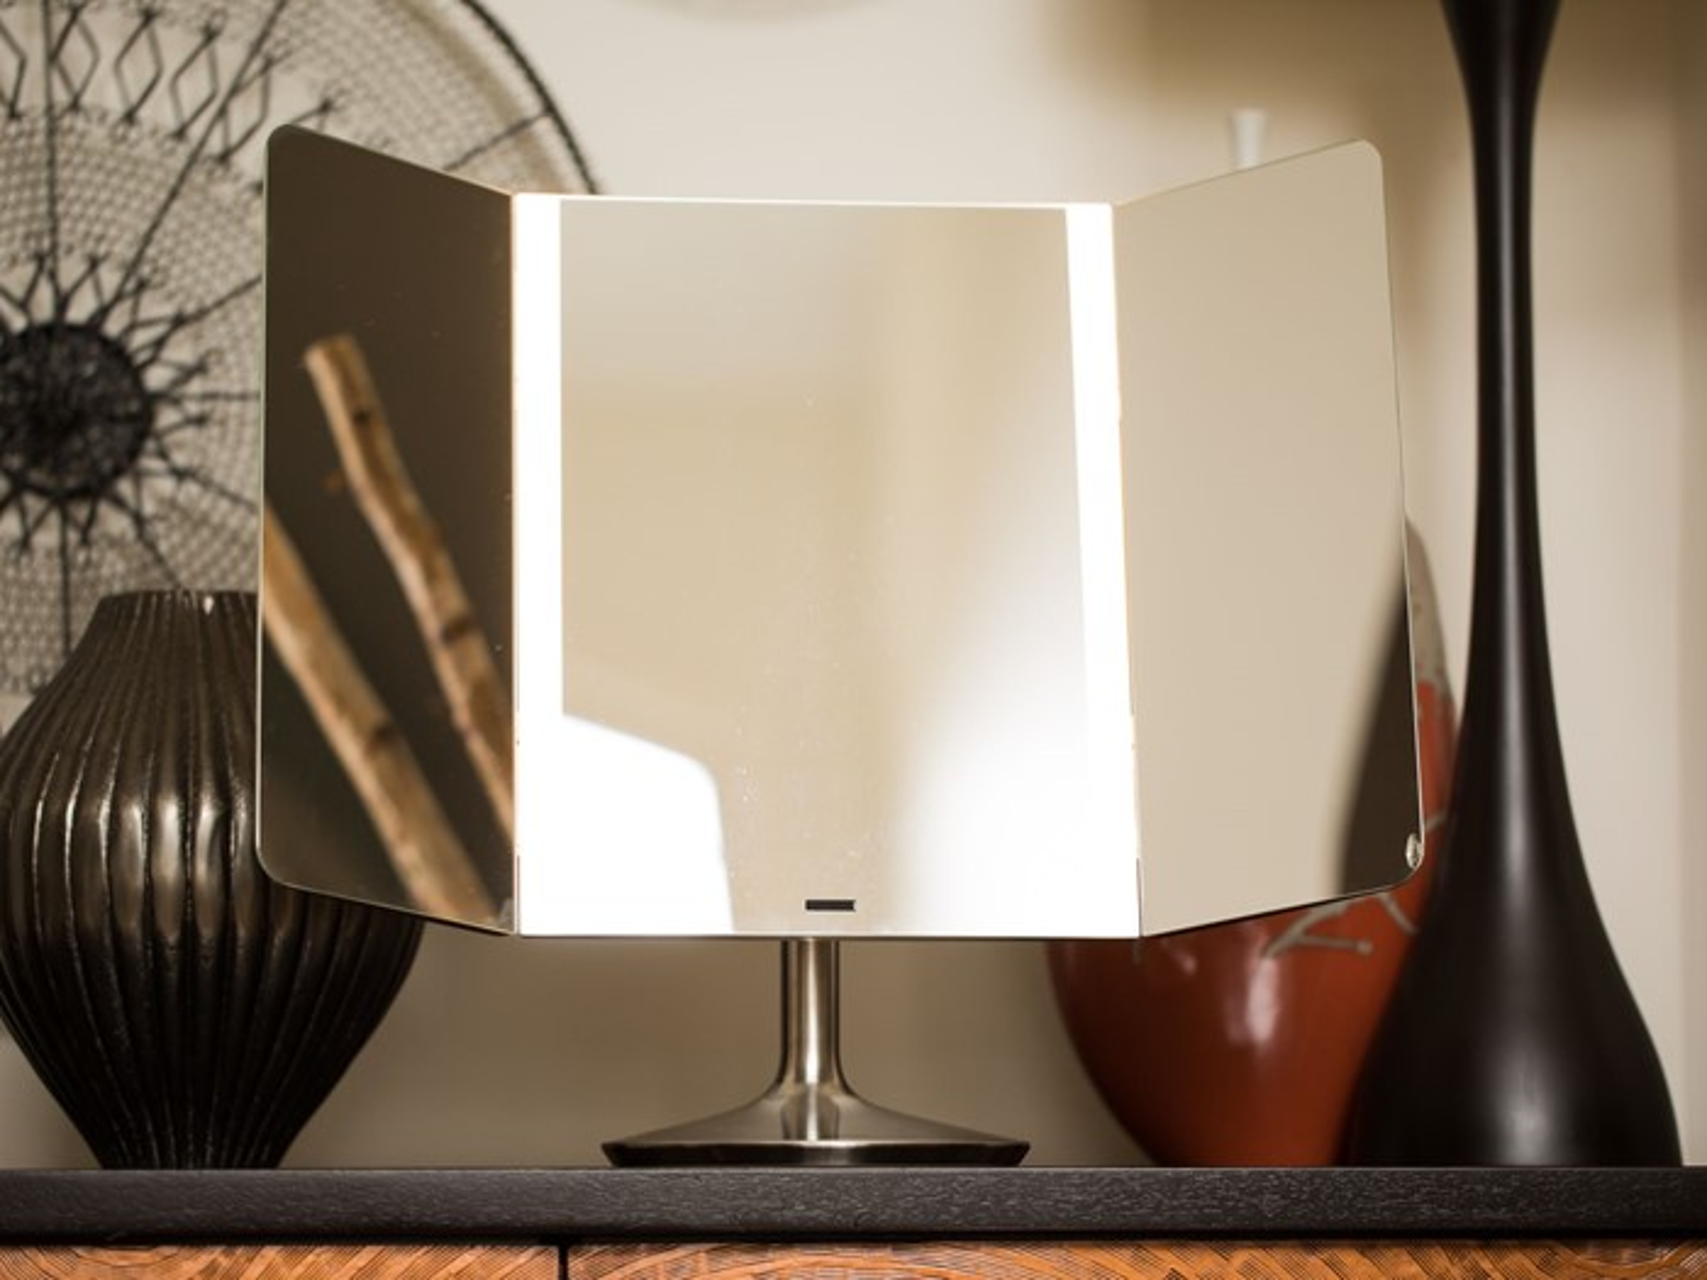 espelho inteligente